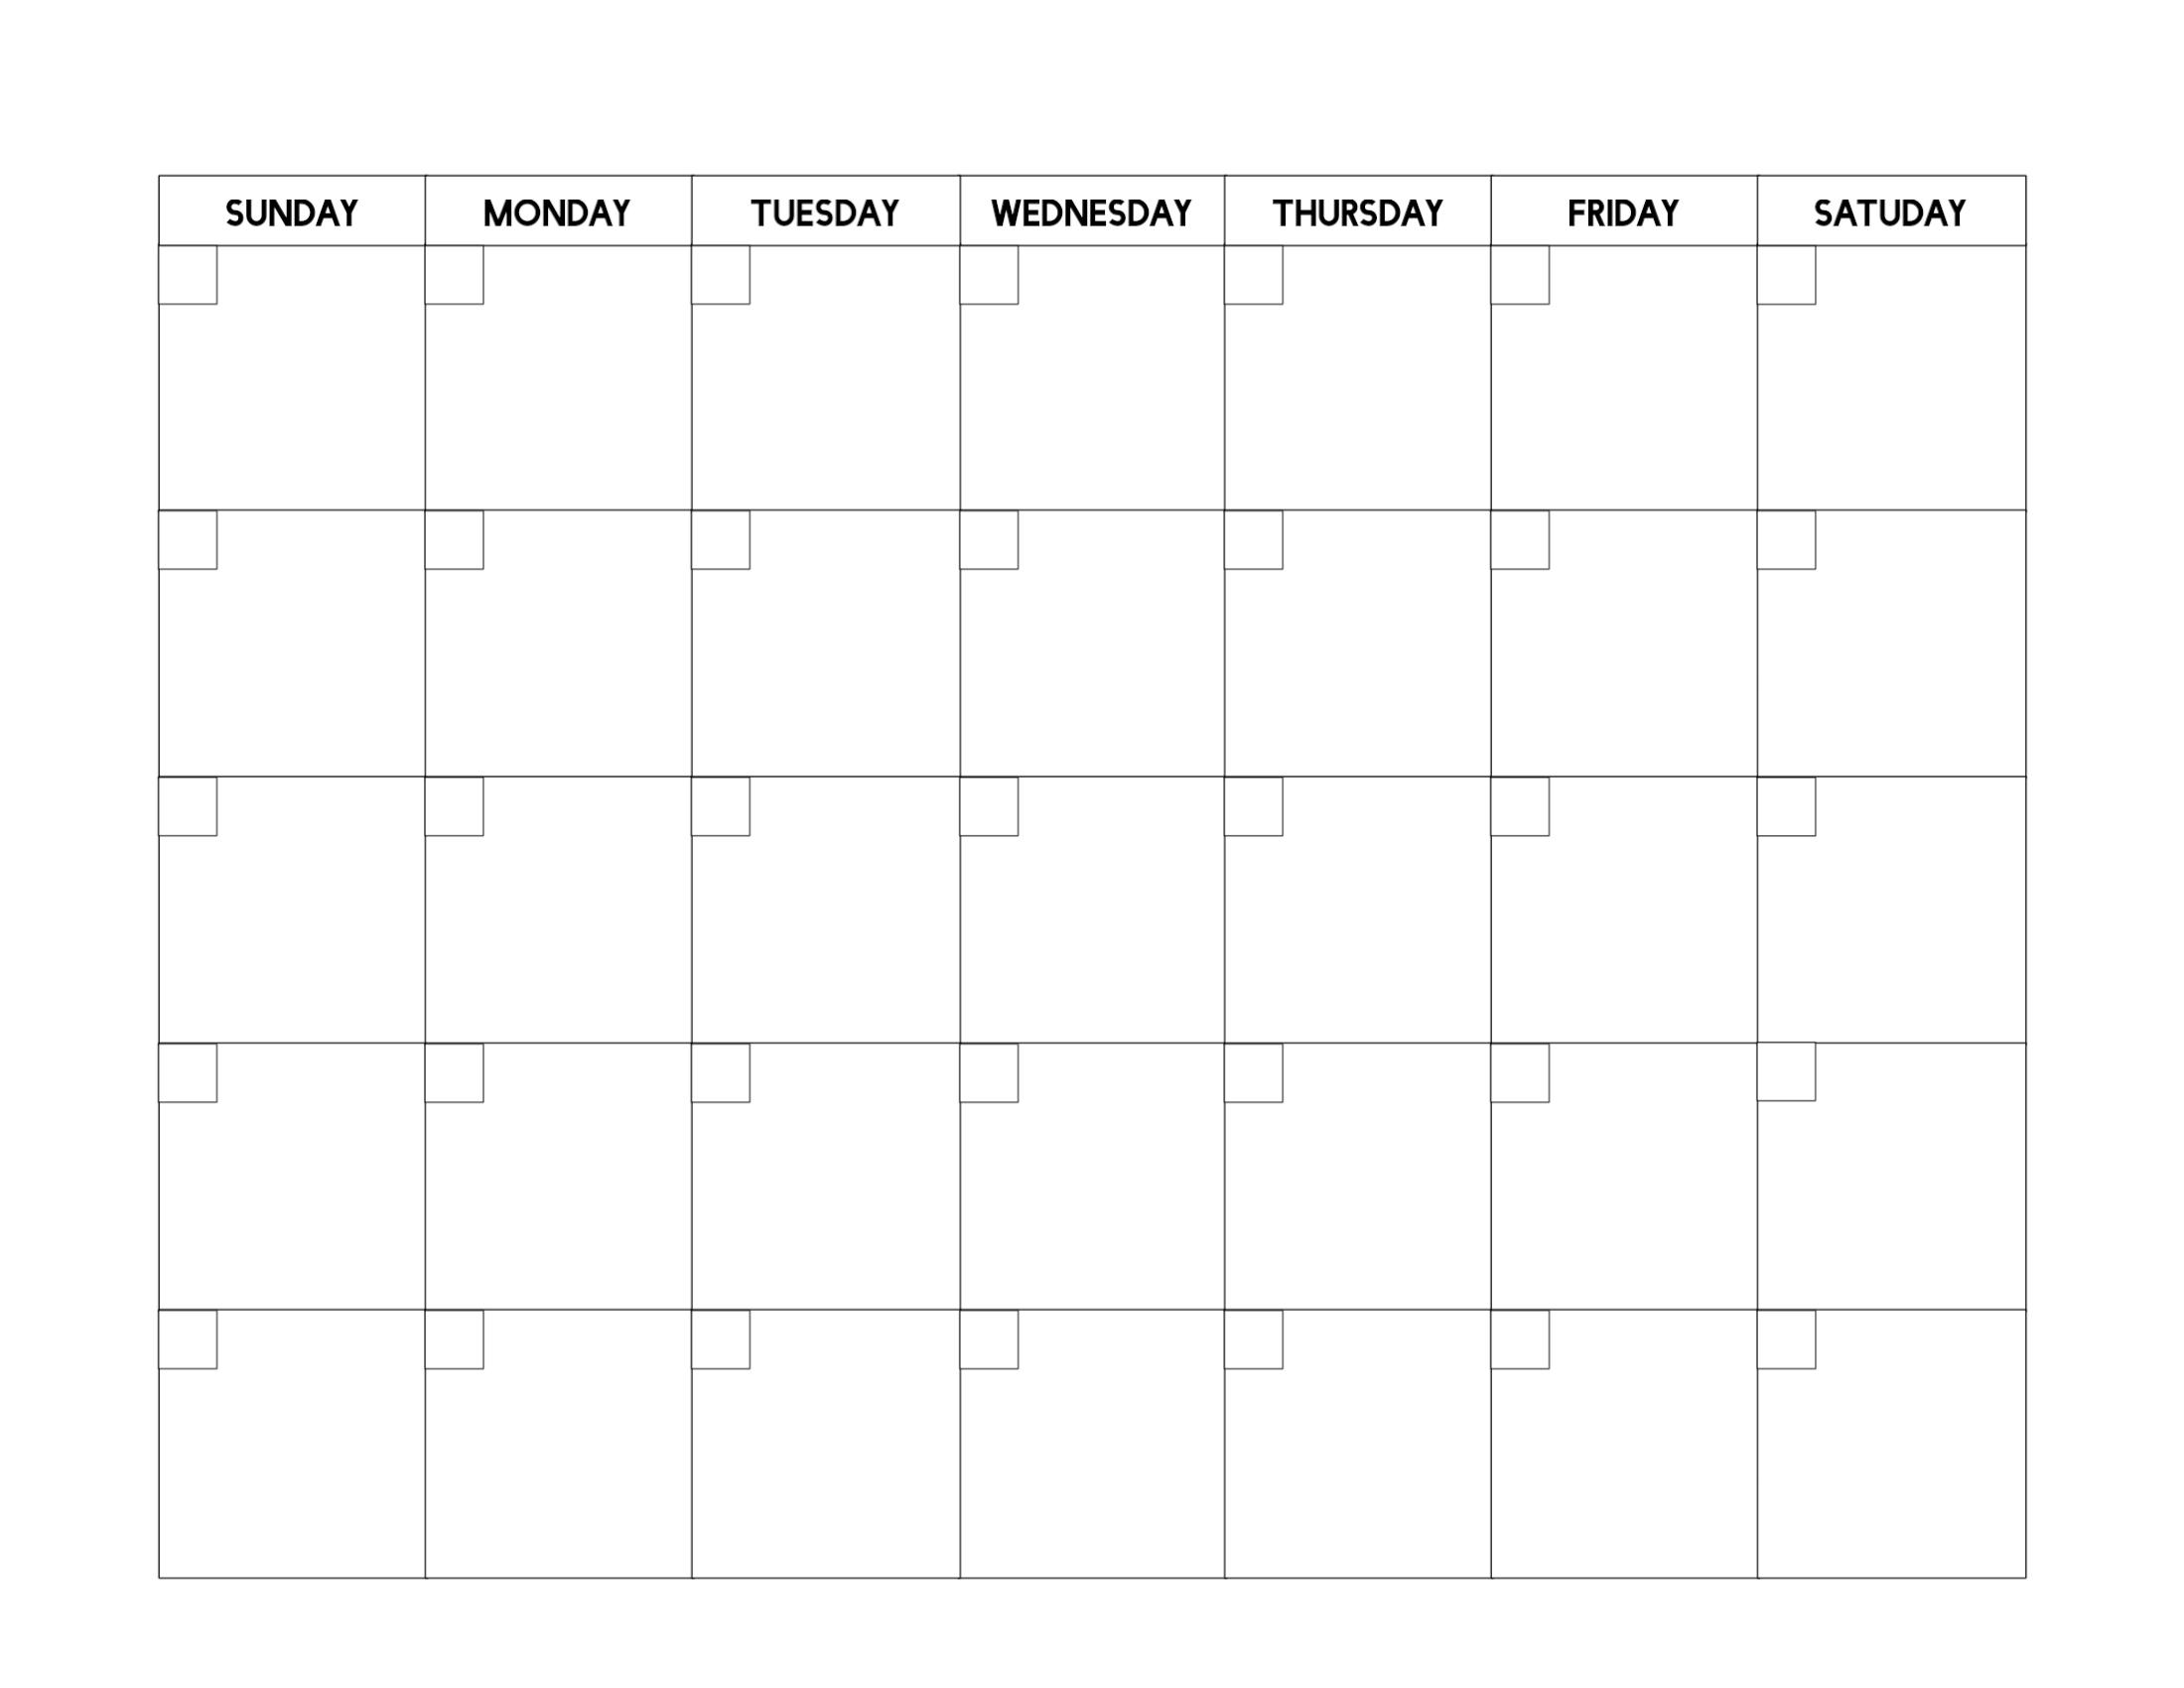 Free Printable Blank Calendar Template | Paper Trail Design Calendar Template To Print Free